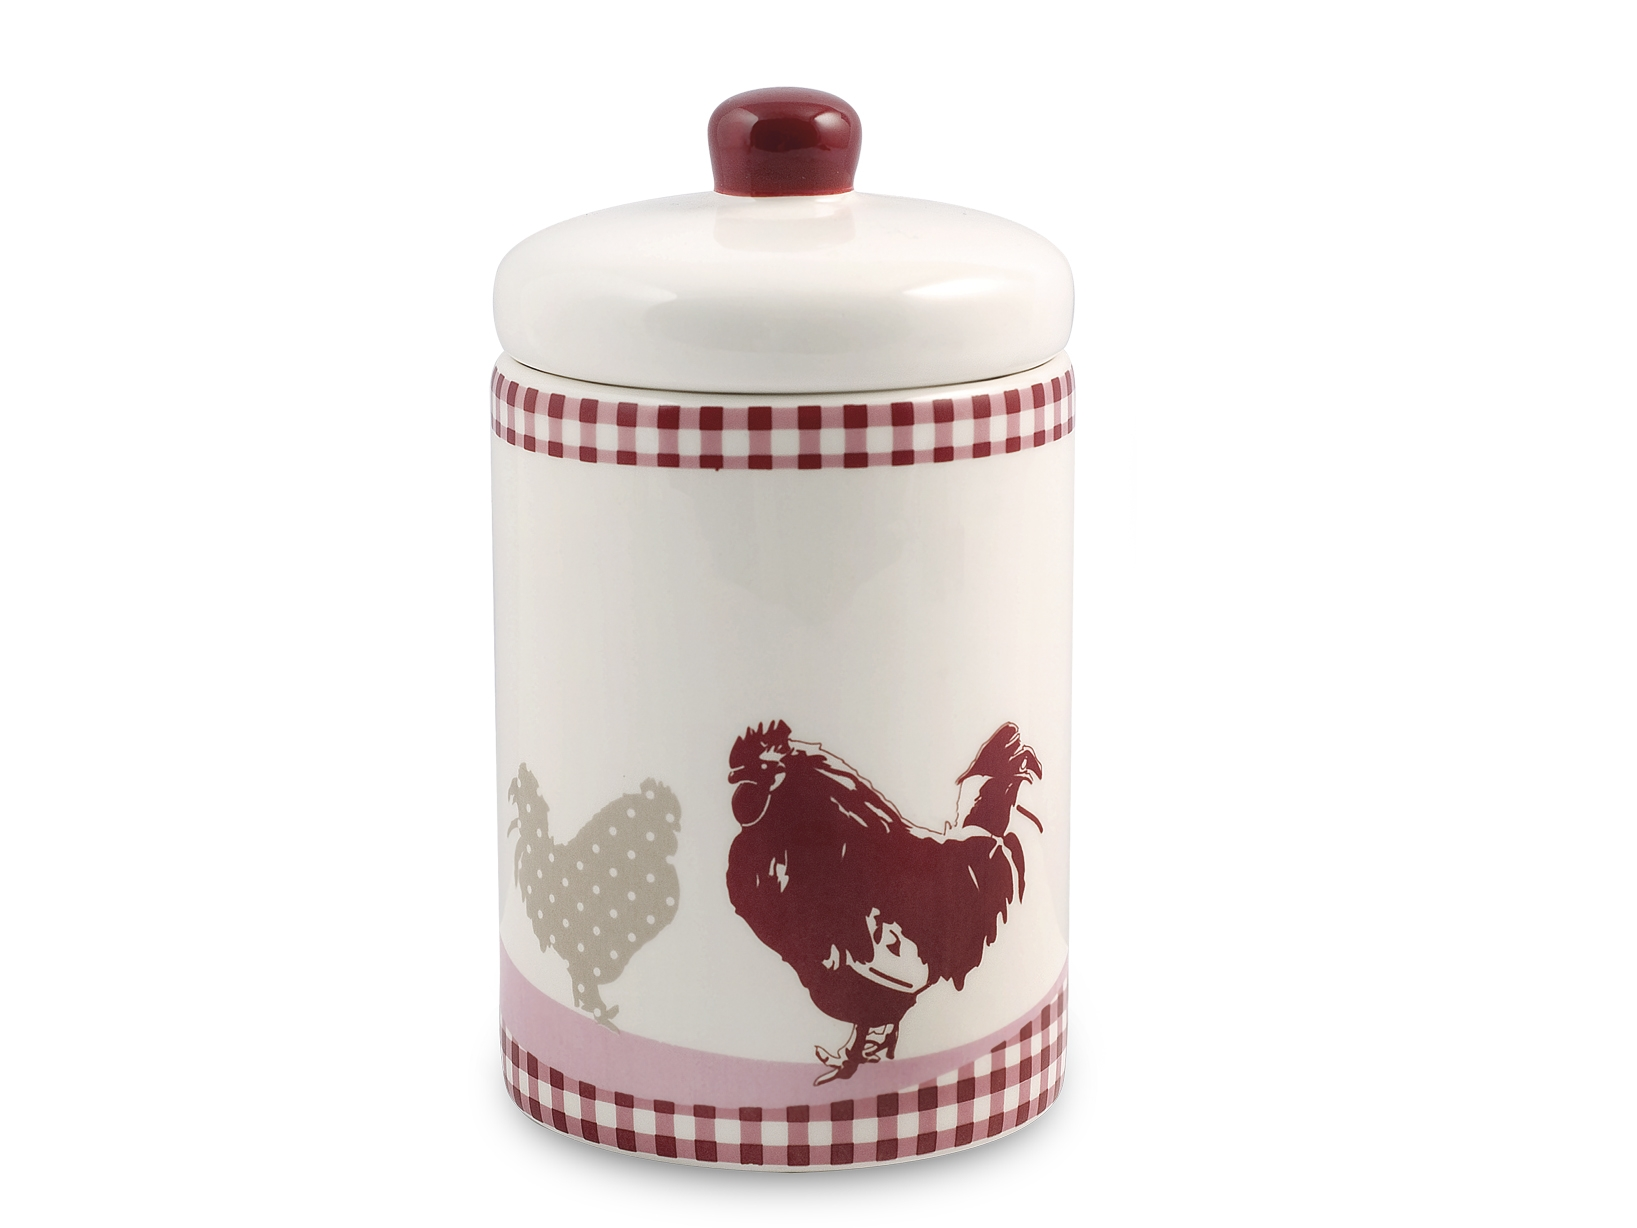 Acquista Set 3 Barattoli Ceramica Coperchi 17528176 | Glooke.com